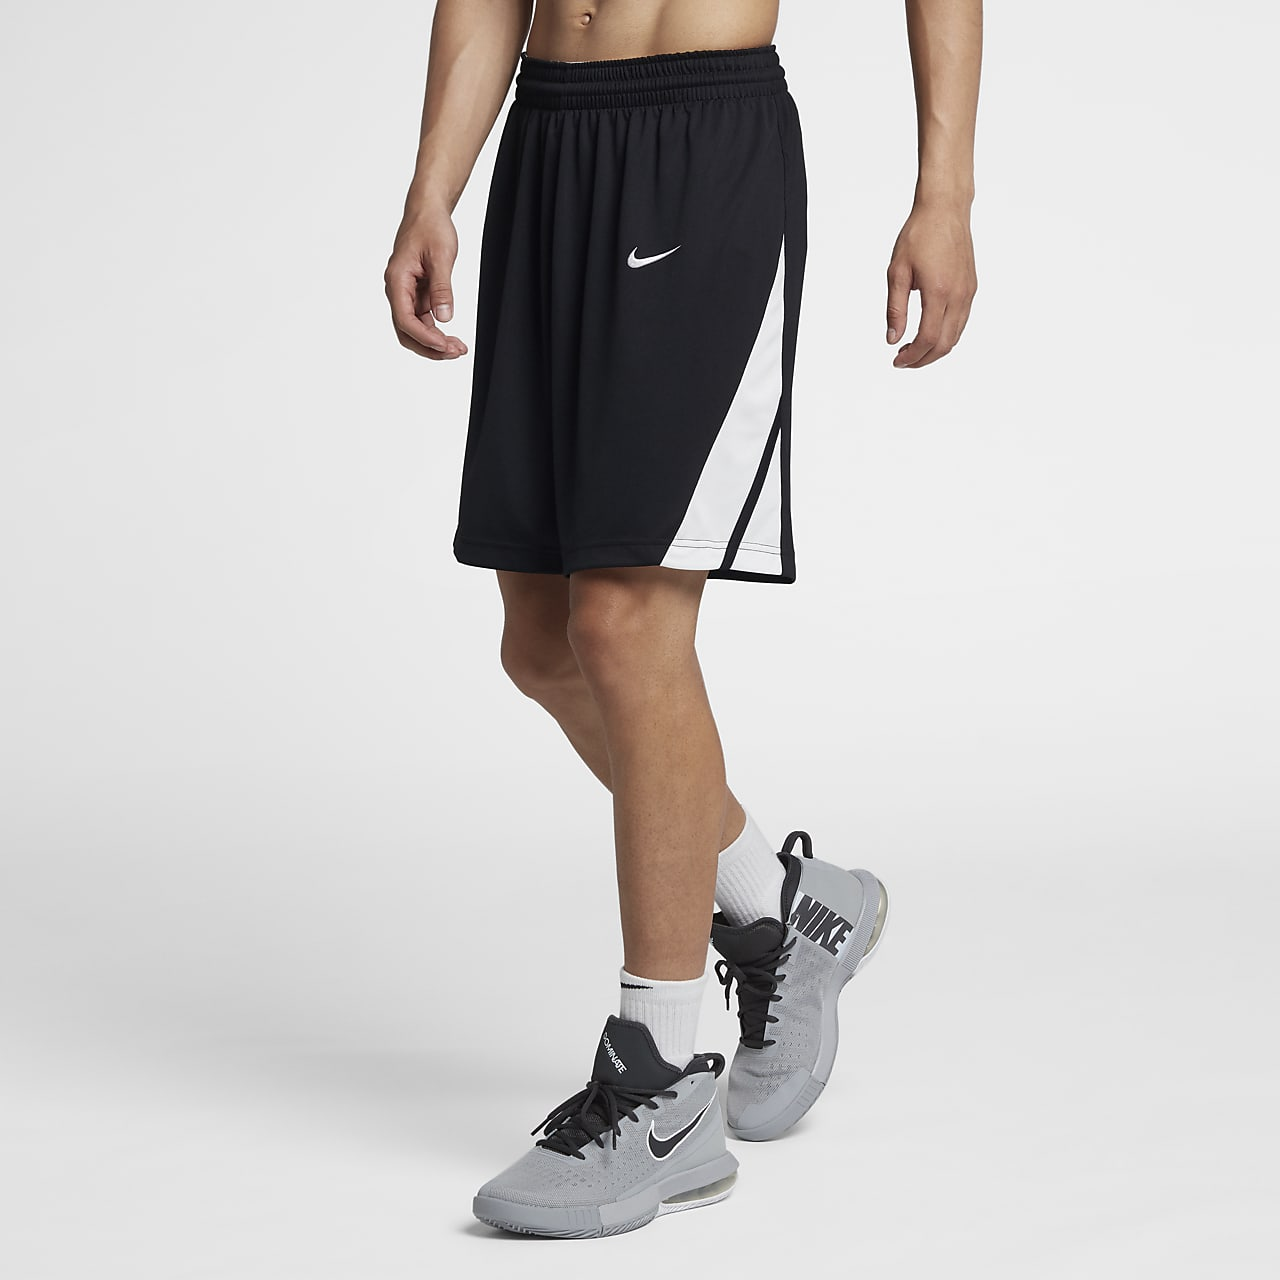 Nike National Men's Basketball Shorts